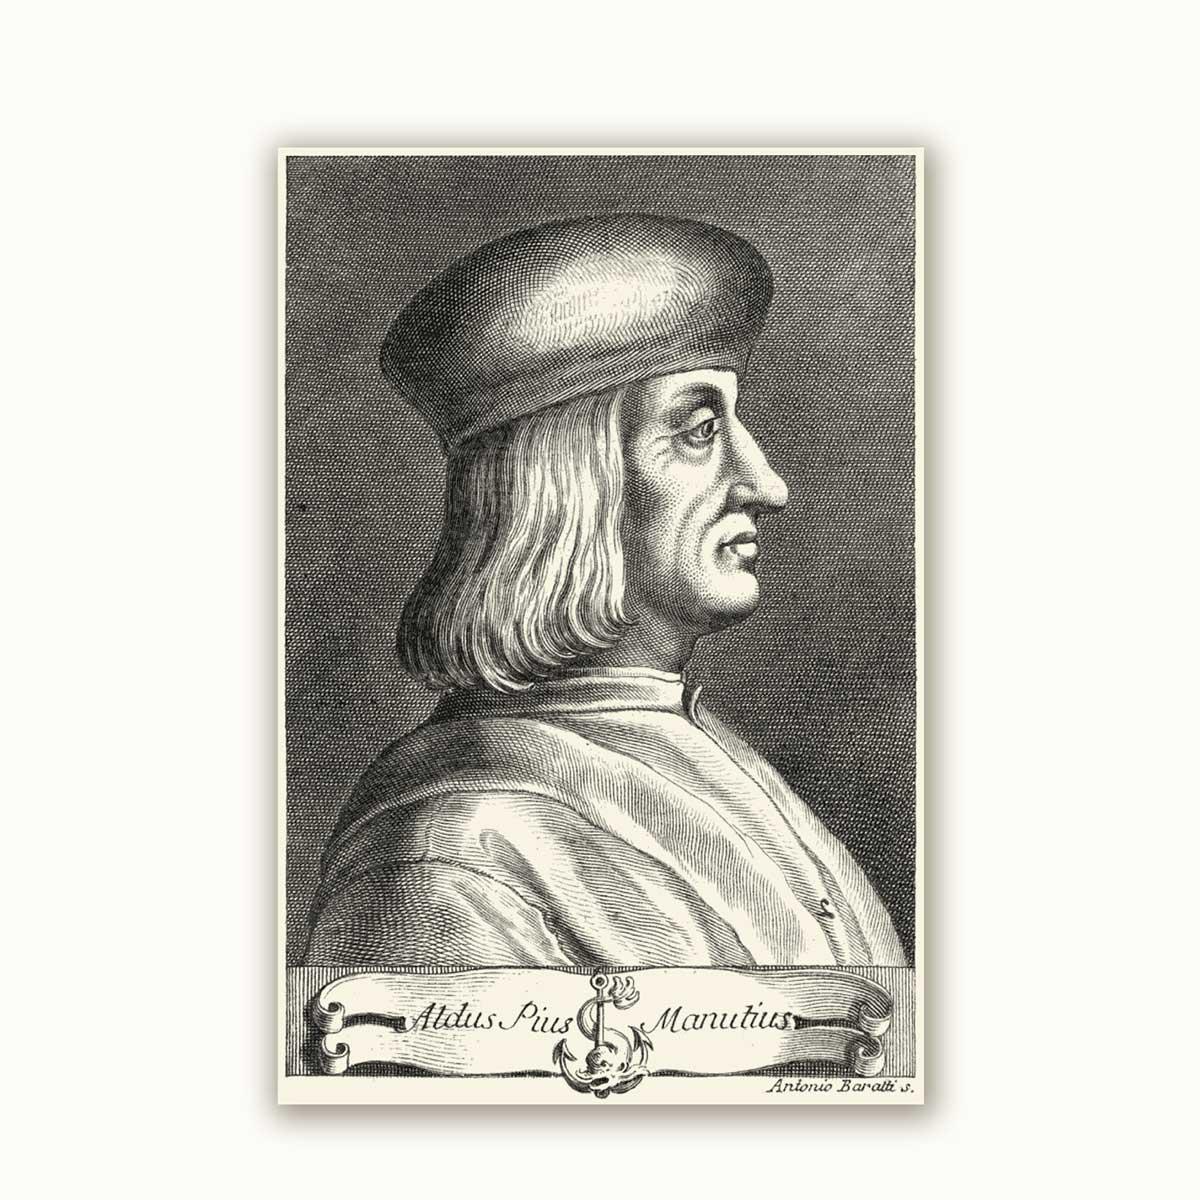 Aldo Manuzio, Baratti